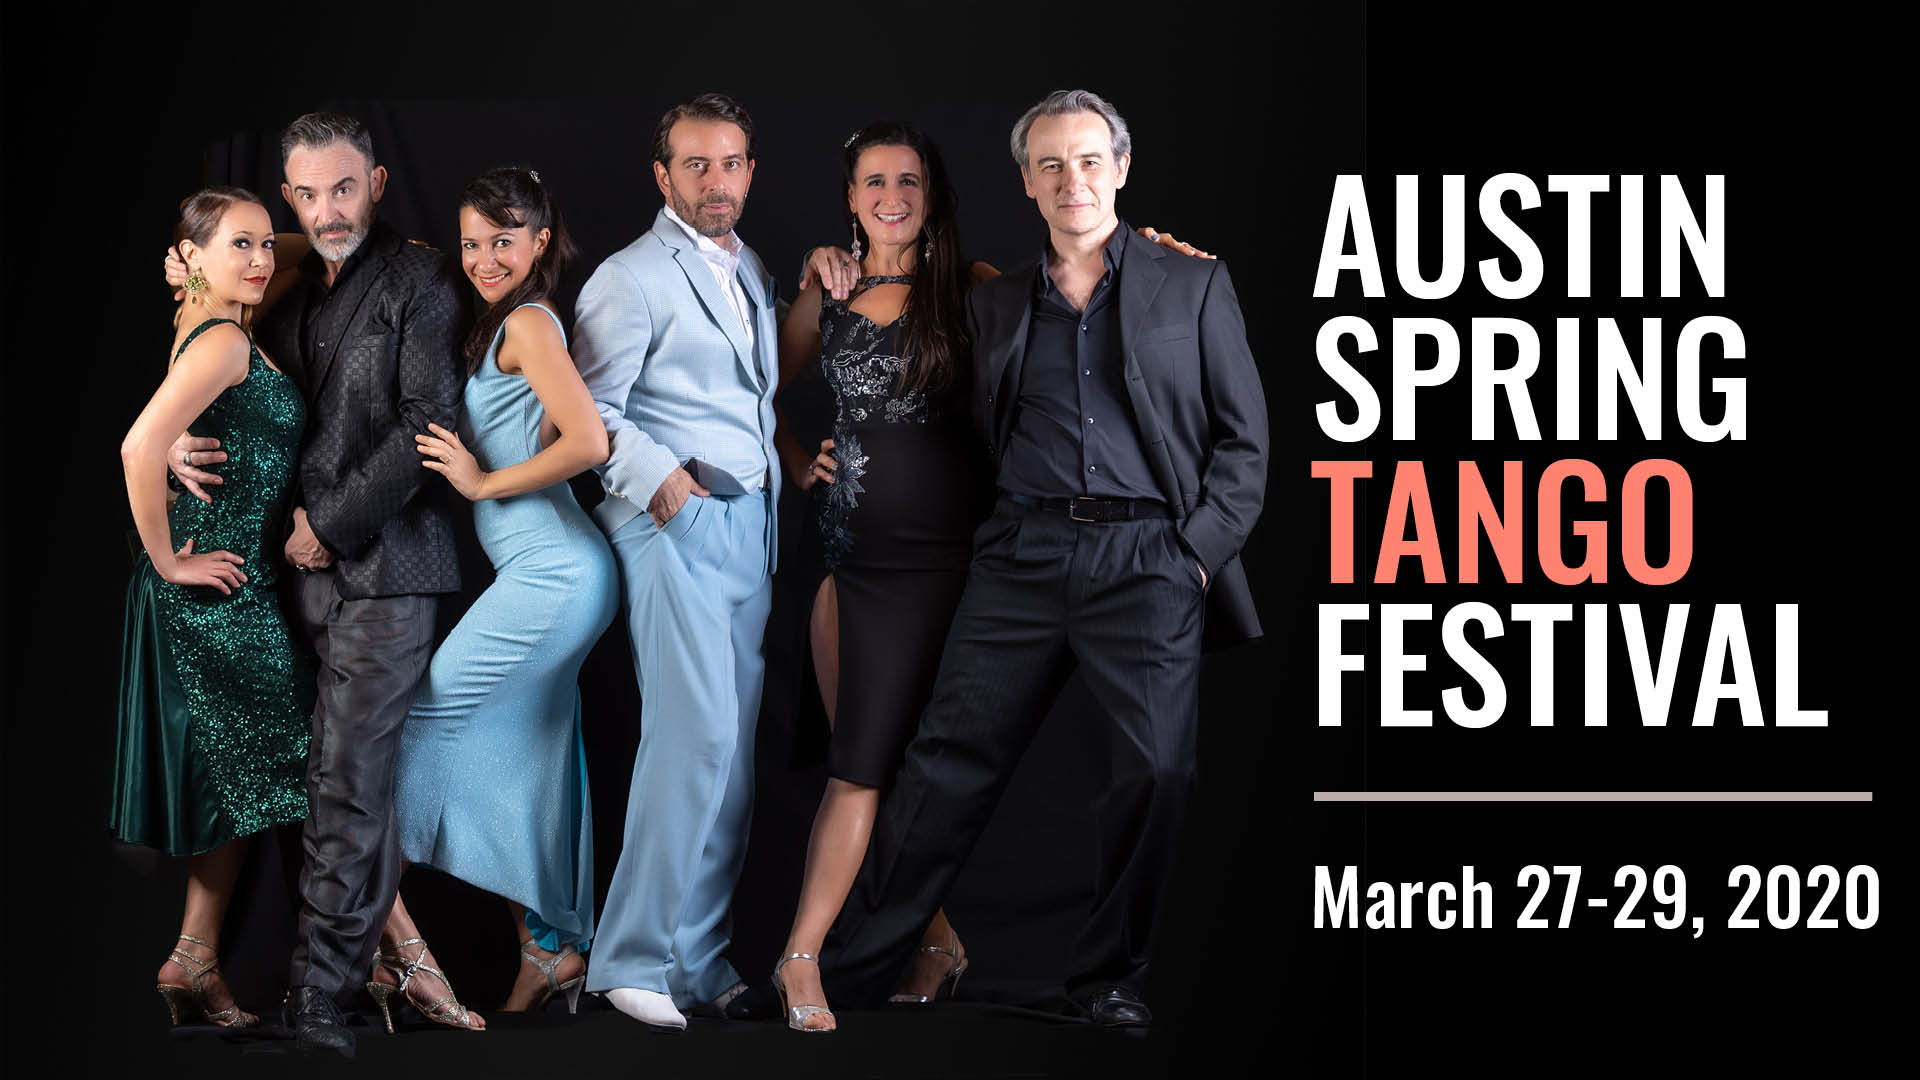 Austin Spring Tango Festival 2020 presented by Austin Tango 1920x1080